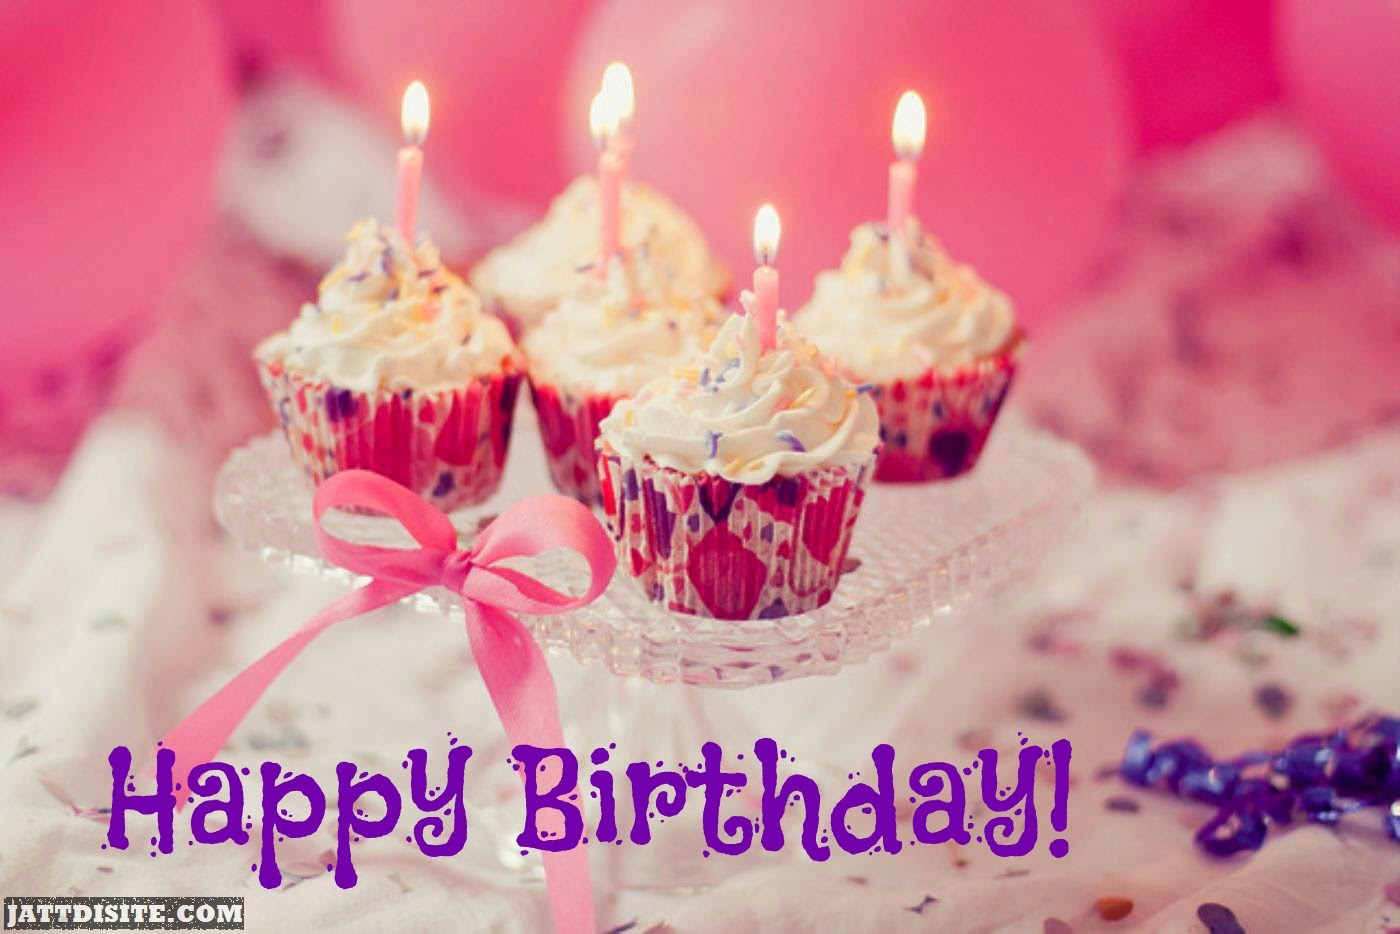 13 Cakes Wishes With Birthday 28thyrs Photo Happy Birthday Cake